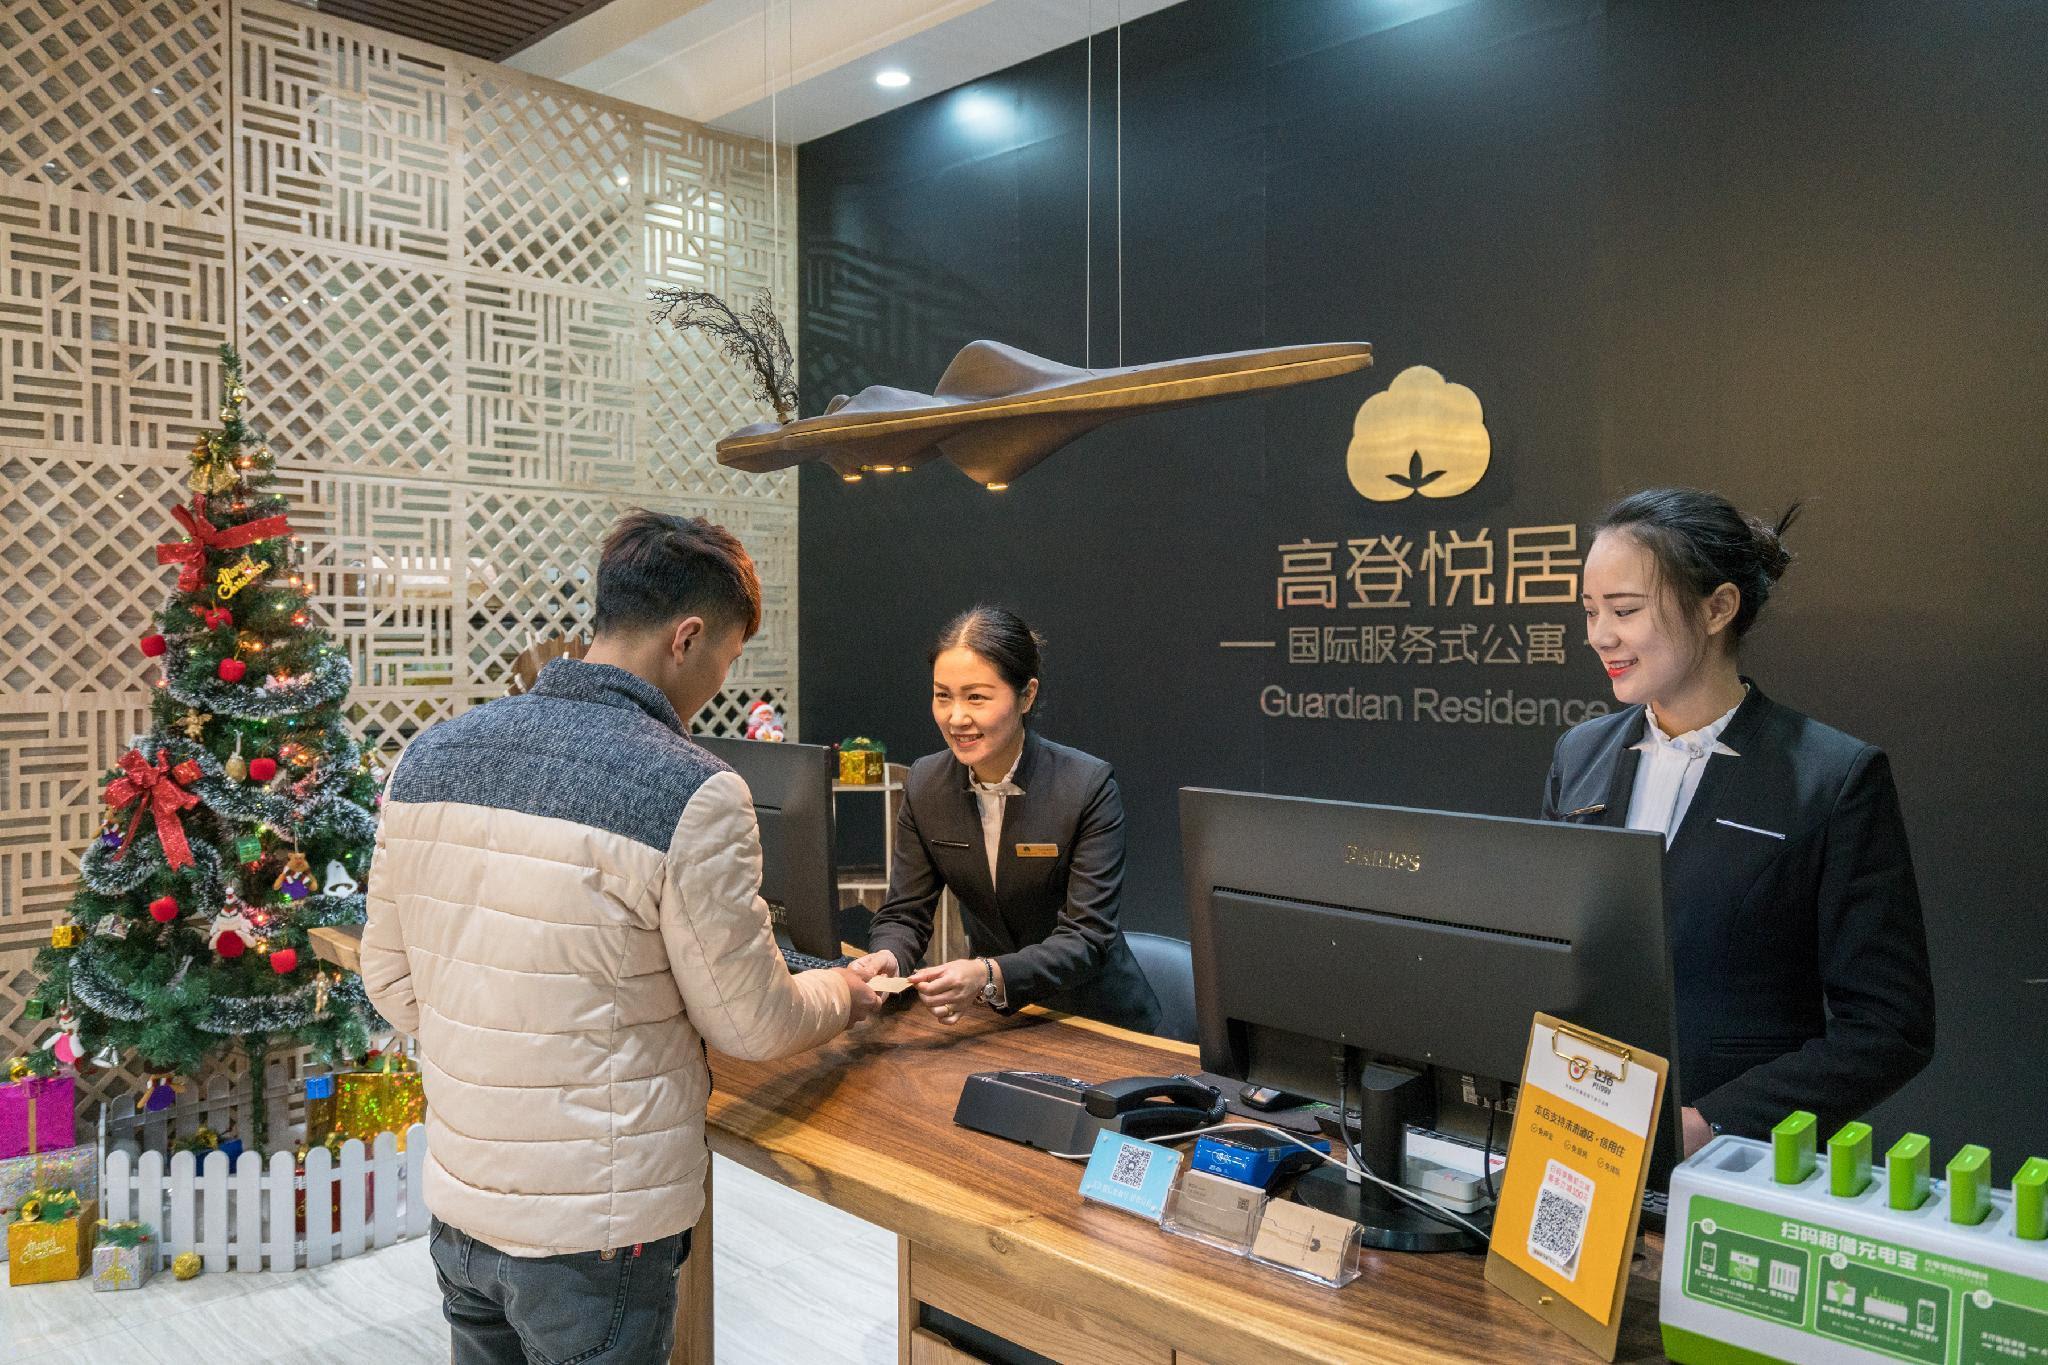 hotel near Changsha Guardian Residence